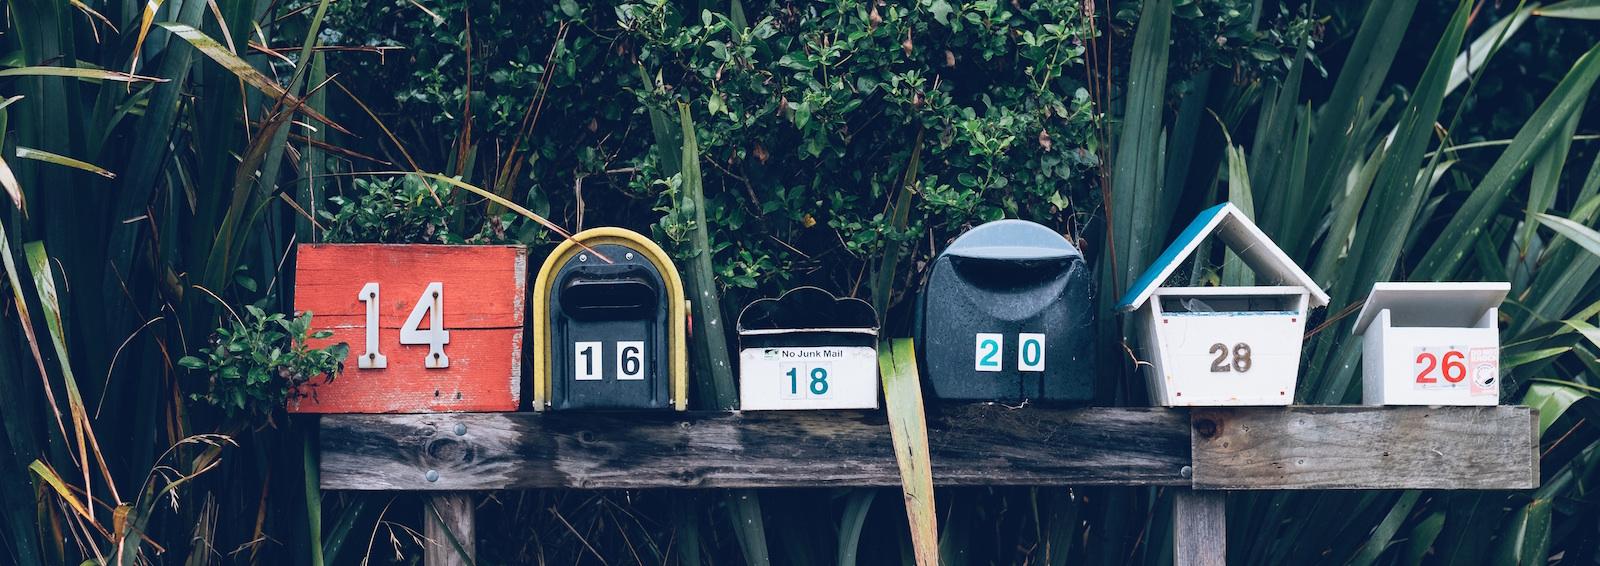 Add custom information to WFFM emails